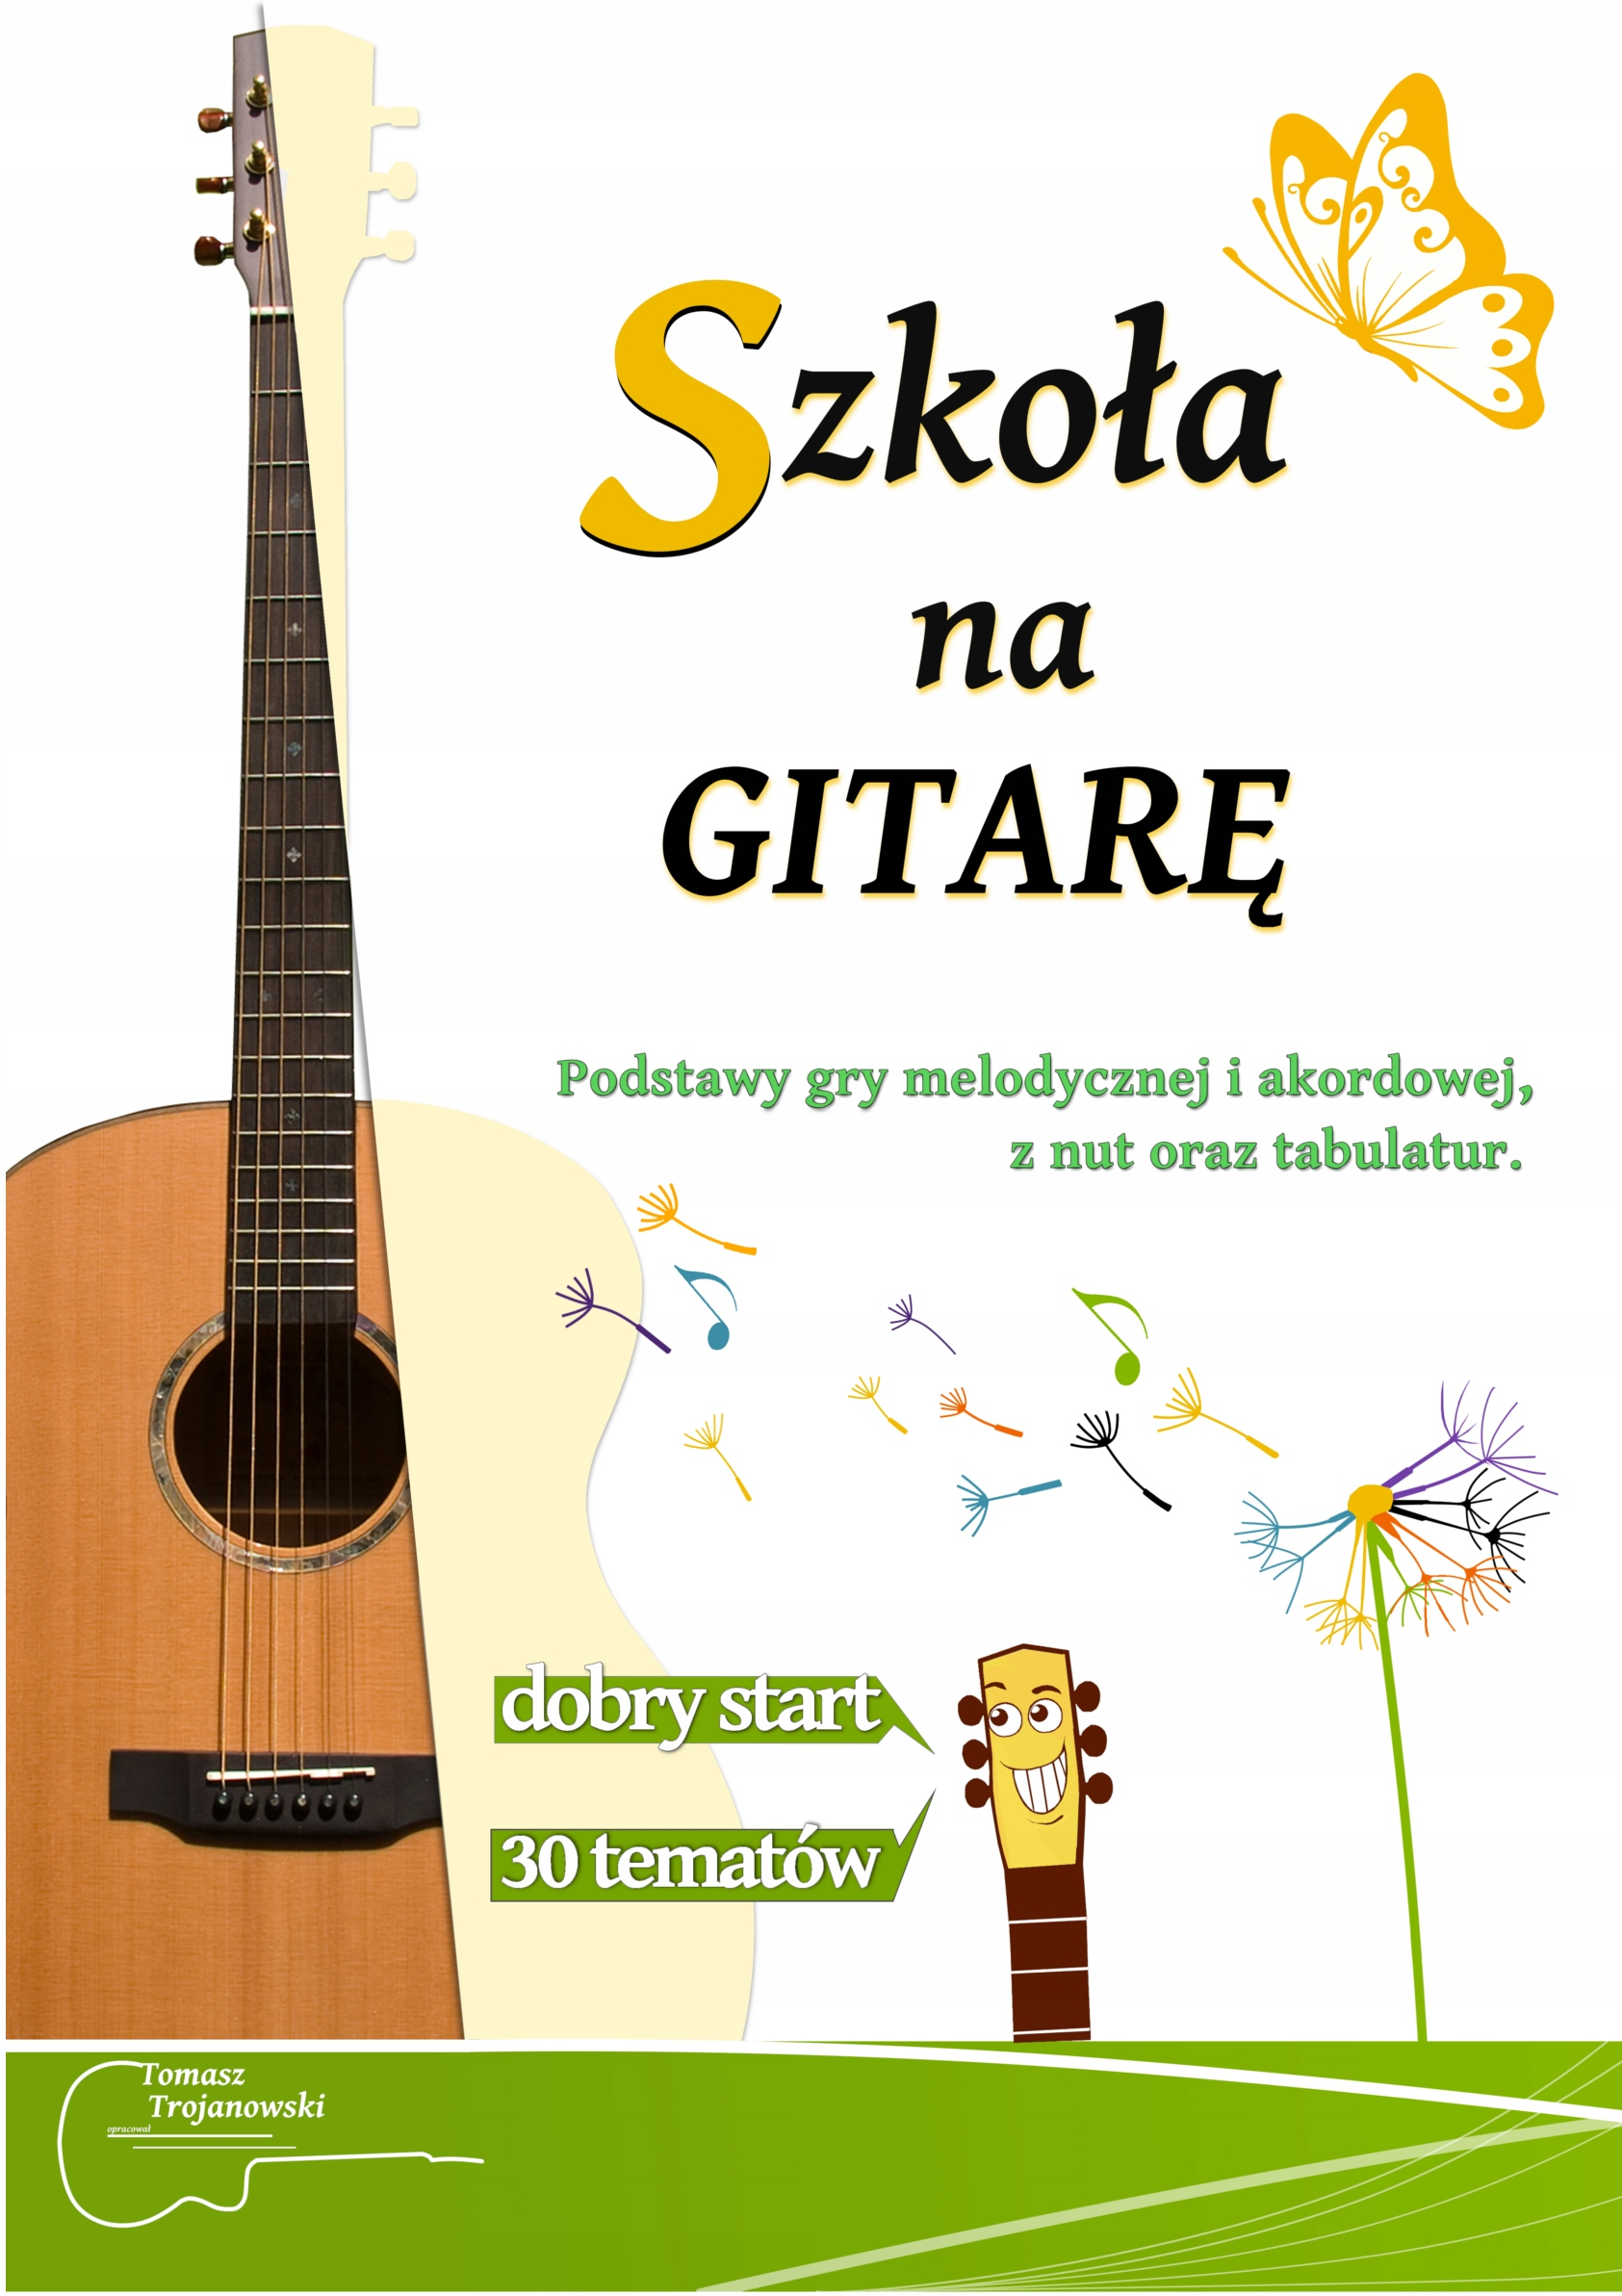 Item School, teaching manual for guitar. Notes, chords, tab.